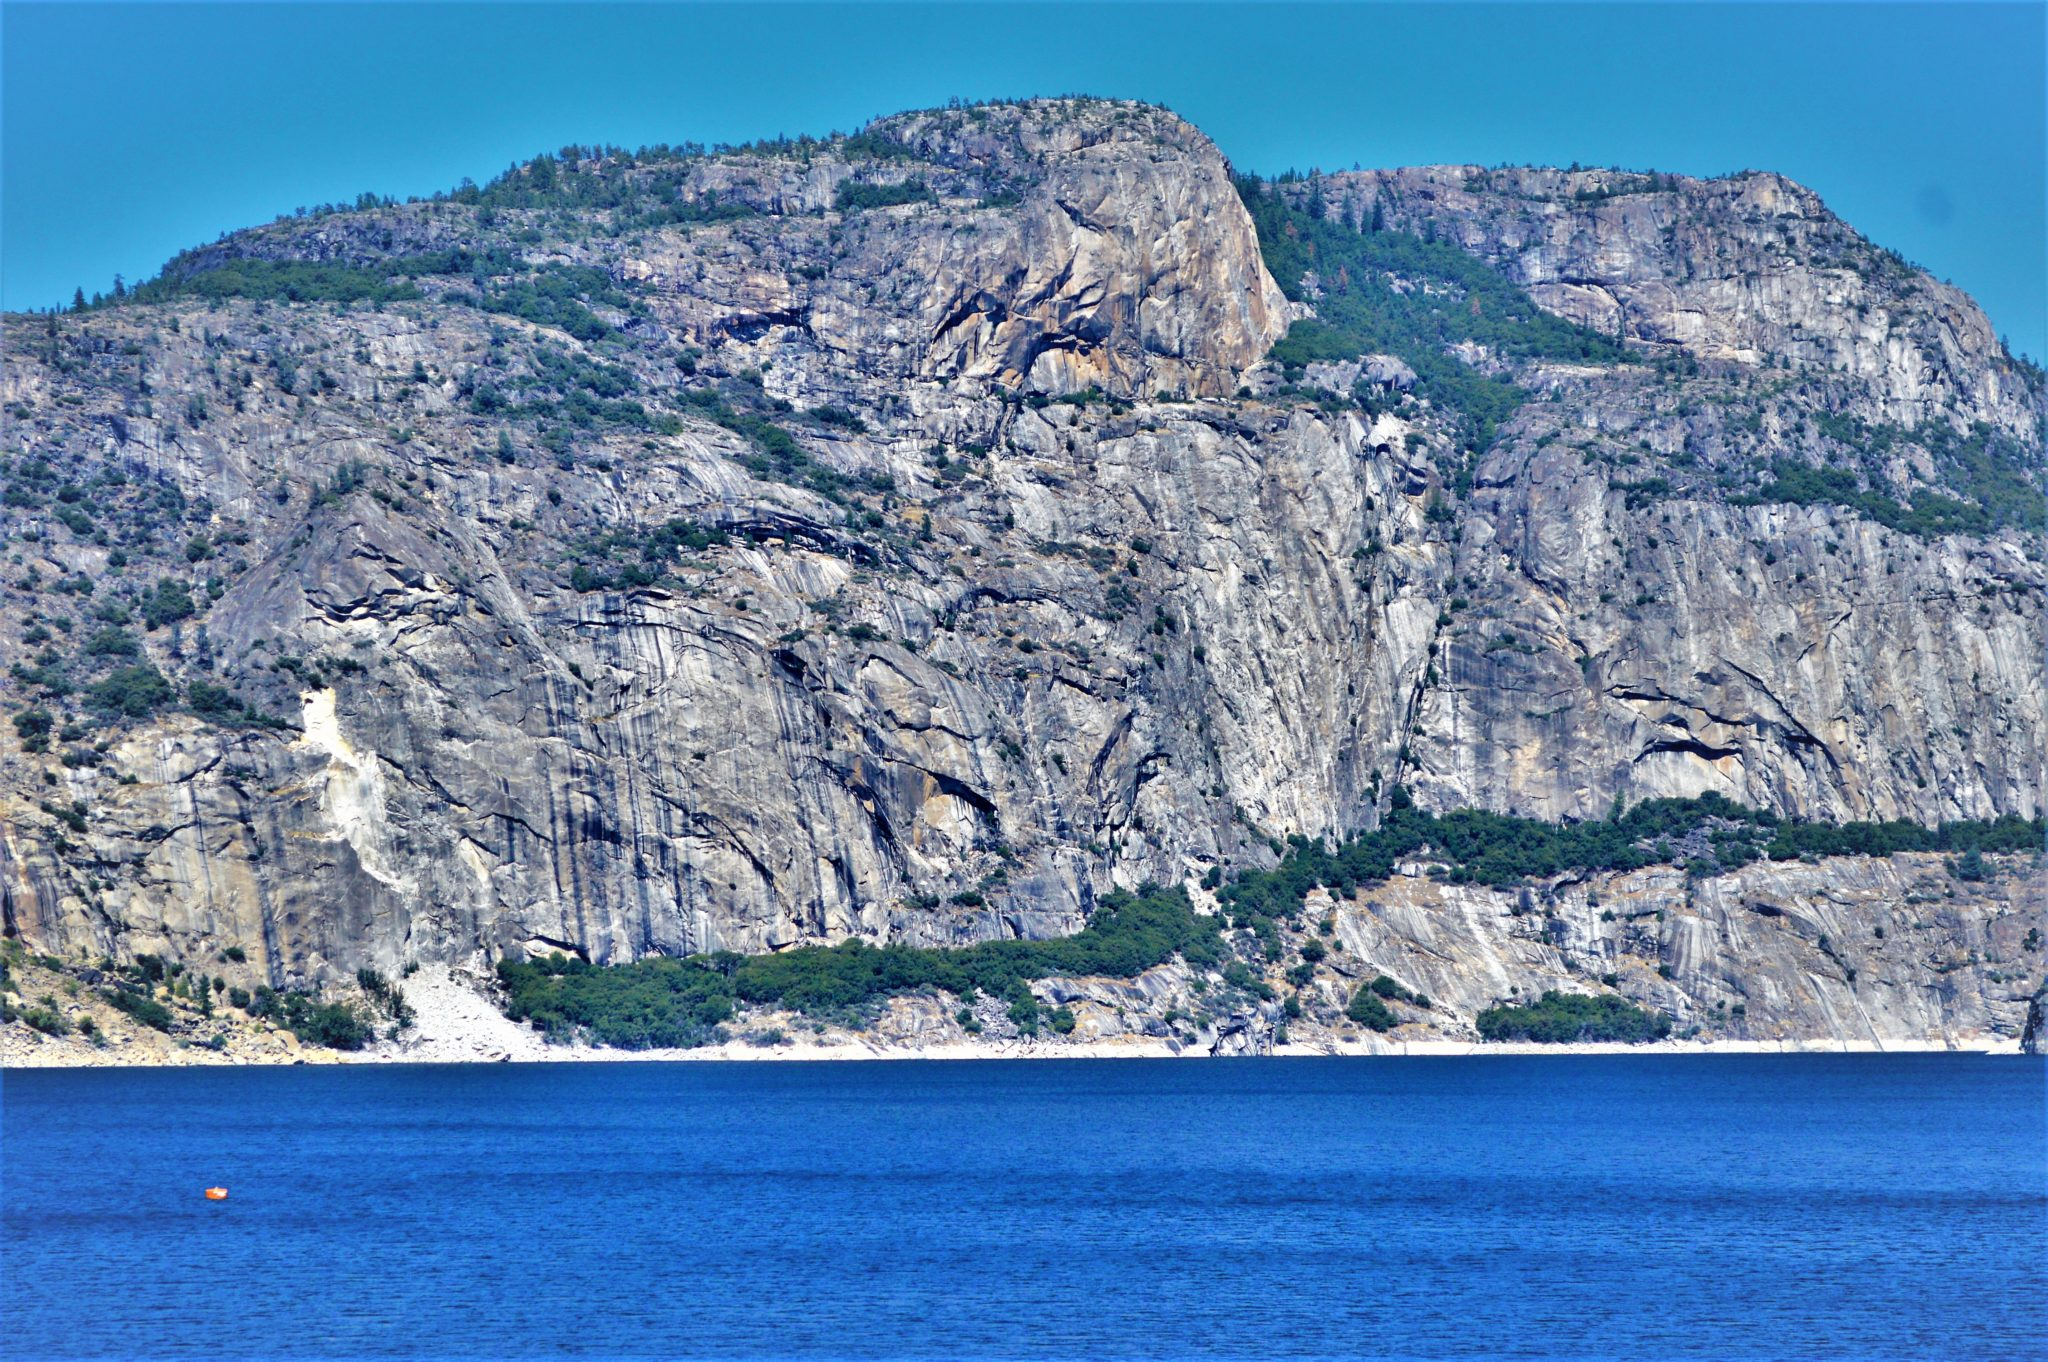 Cliffs at Hetch Hetchy Reservoir, California